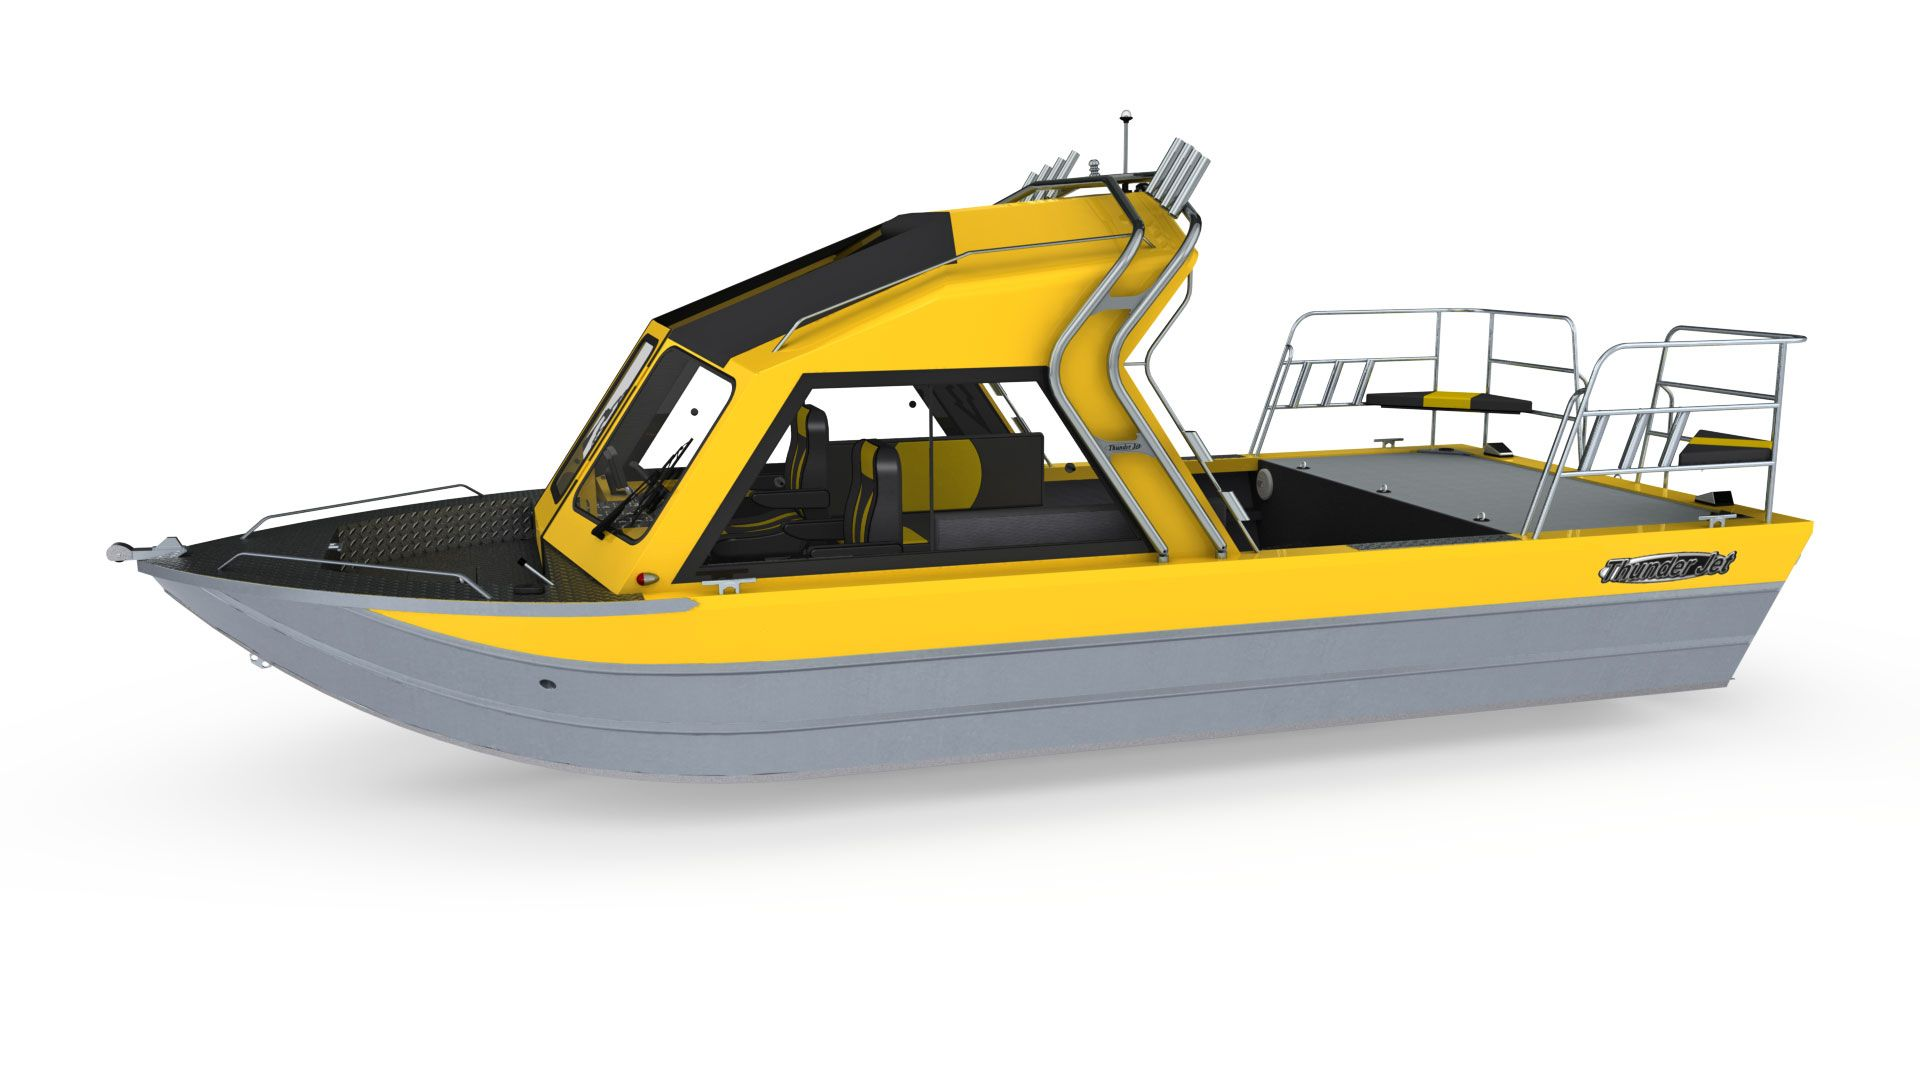 23 Foot Aluminum Jet Boat Thunder Jet Maxim Classic Med Billeder Bad